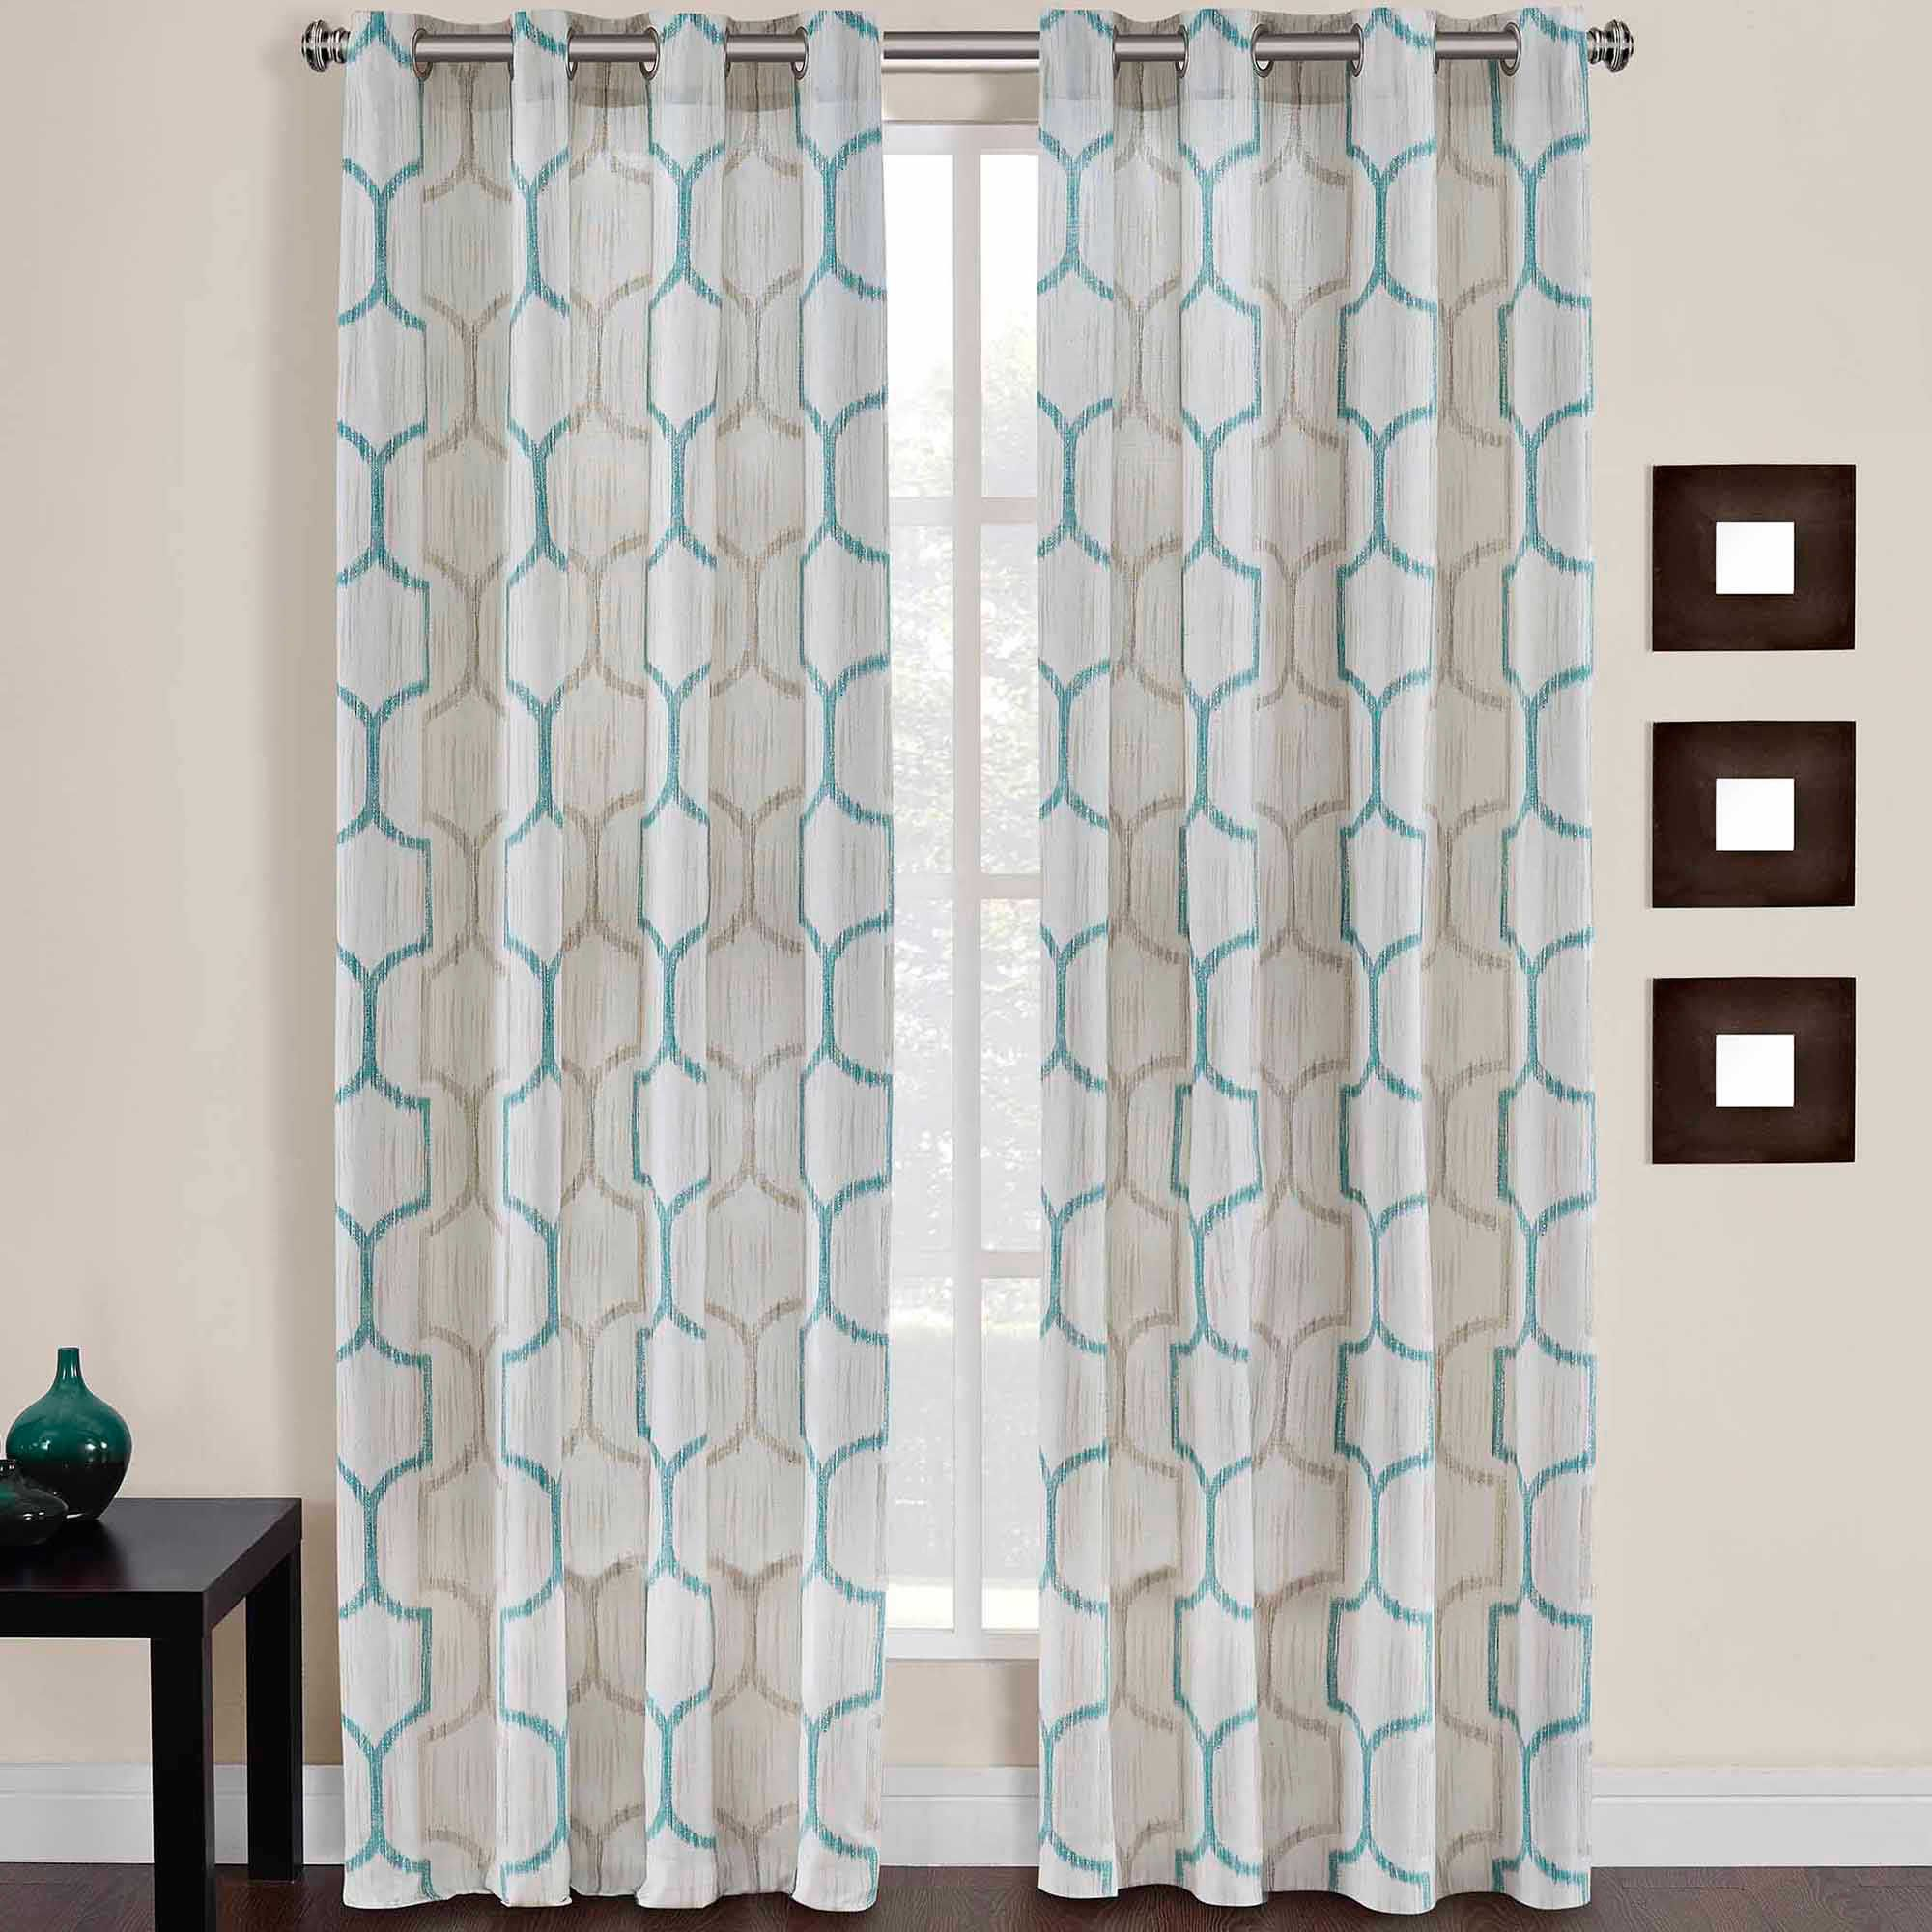 Portinari Grommet Top 95 Inch Window Curtain Panel In Natural